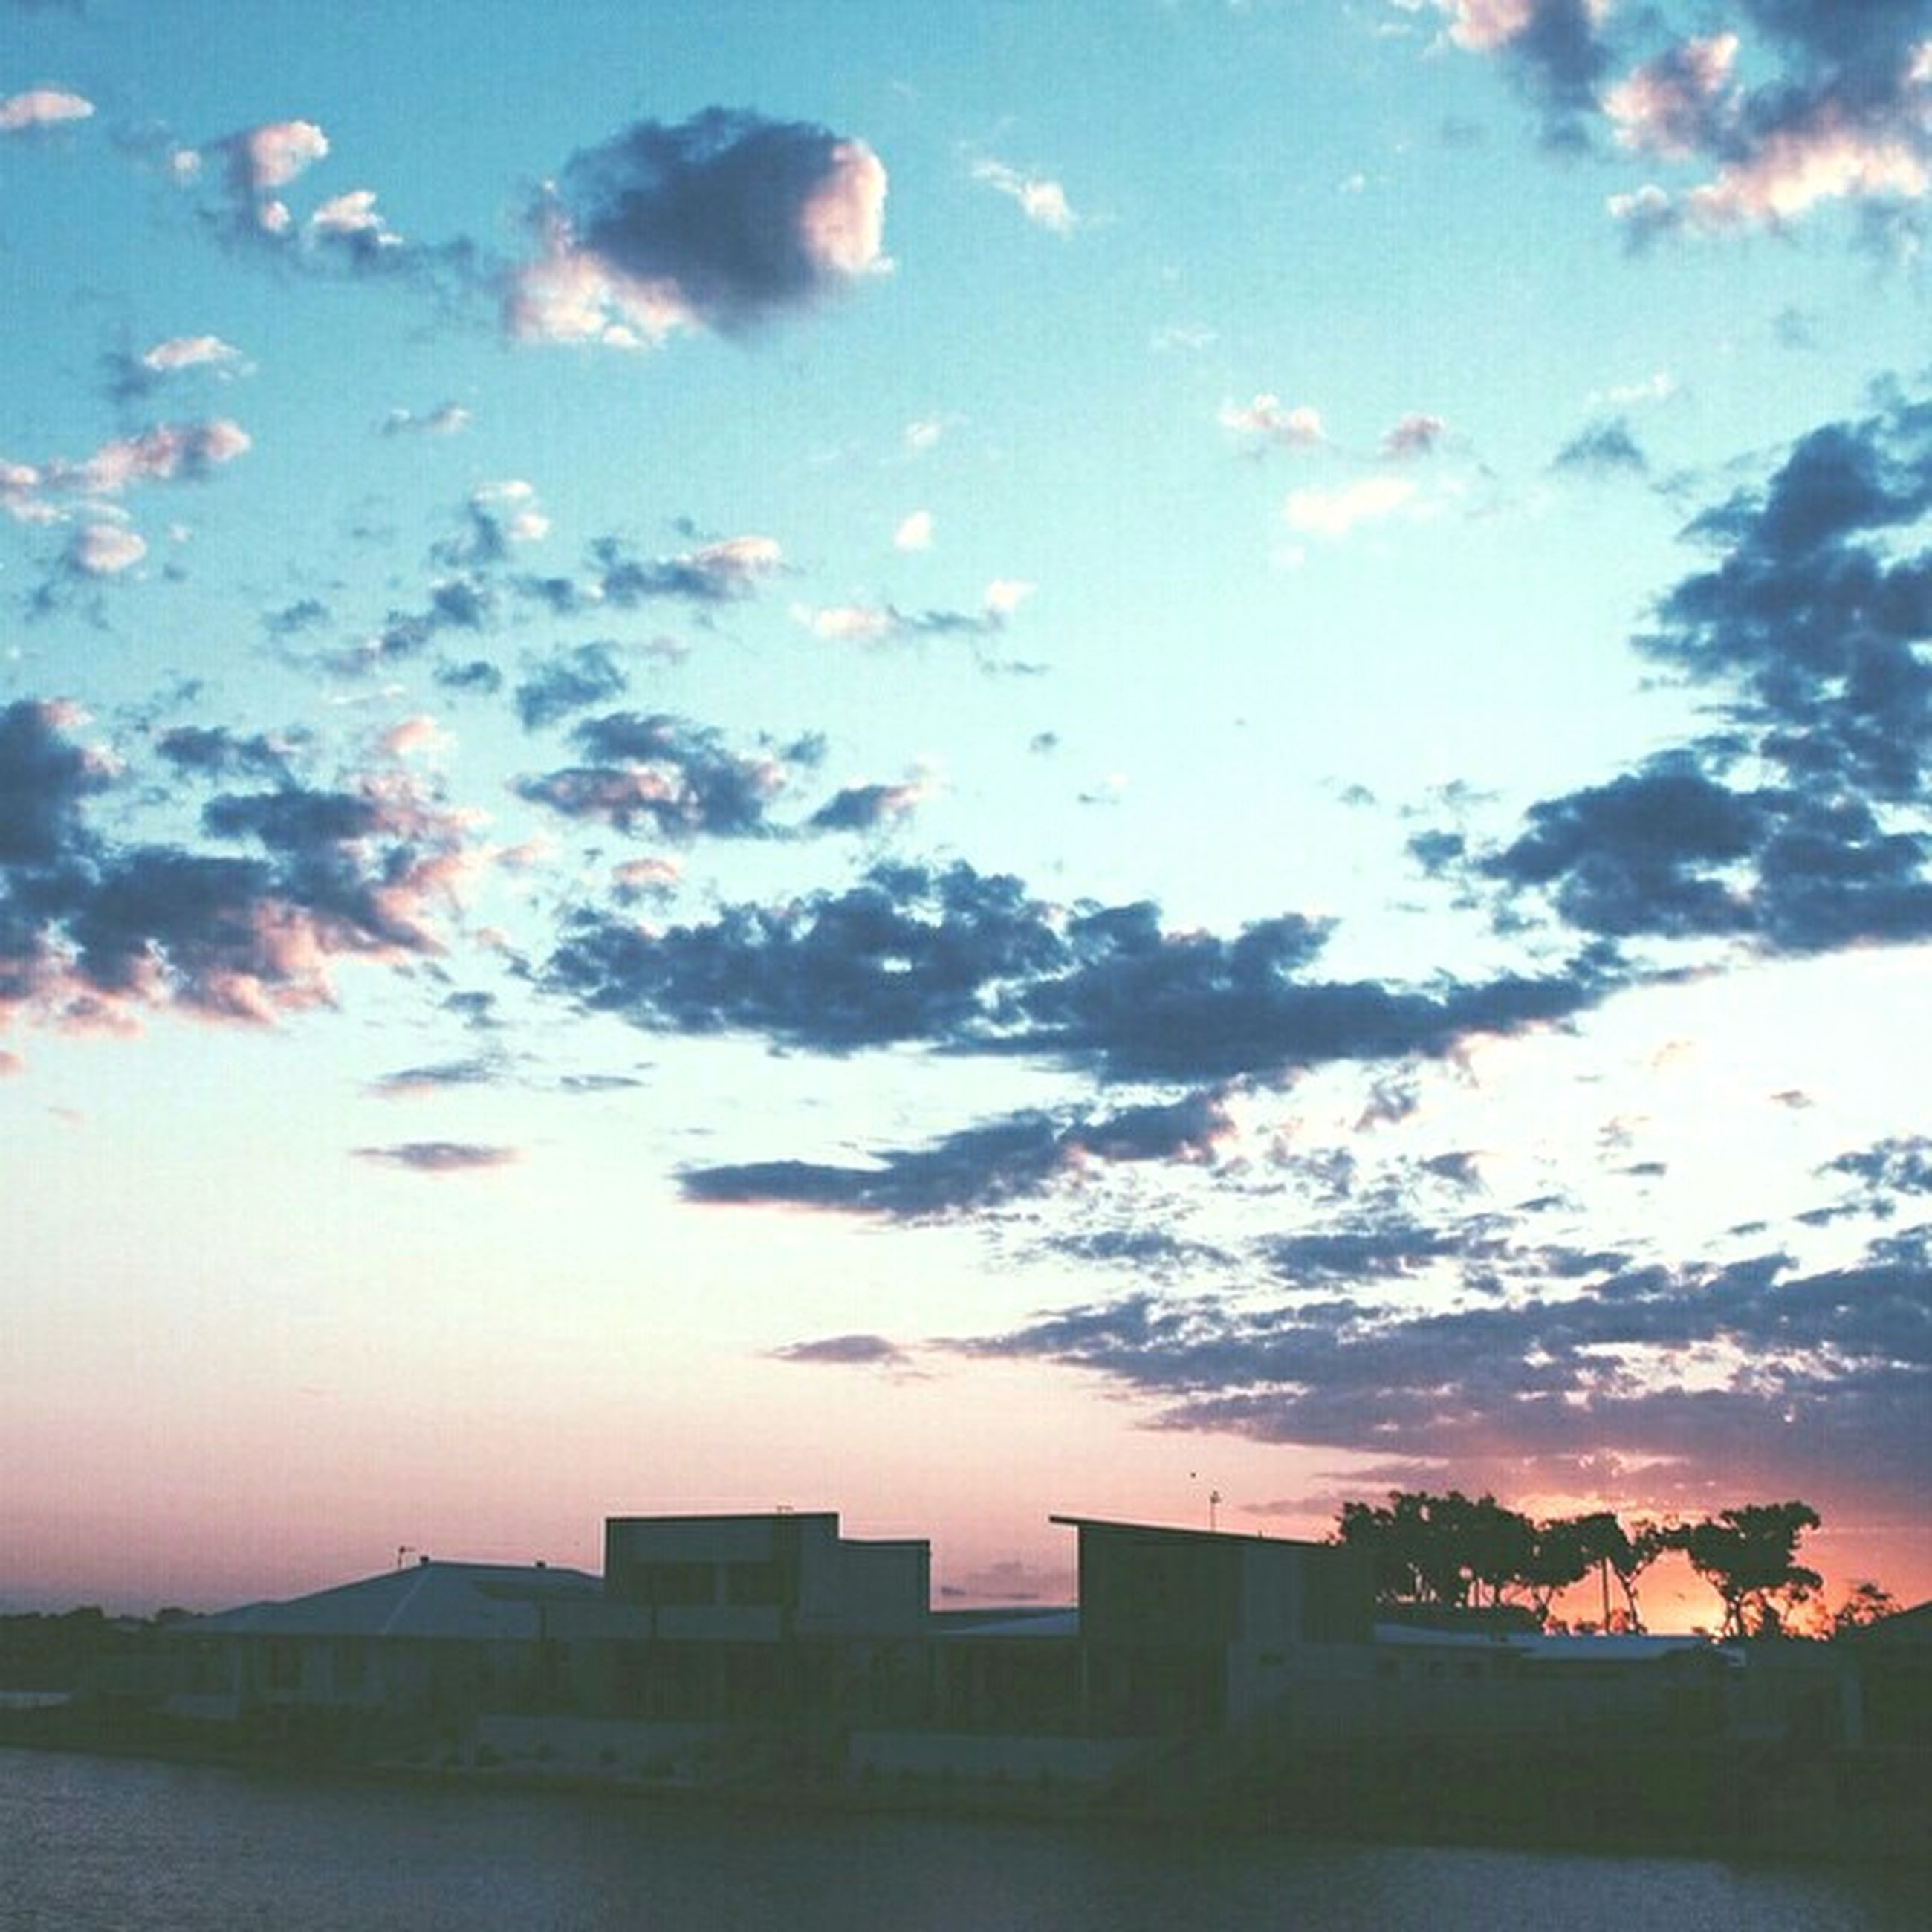 sunset, building exterior, architecture, built structure, sky, cloud - sky, orange color, house, cloud, residential structure, residential building, cloudy, beauty in nature, scenics, city, nature, silhouette, outdoors, building, dusk